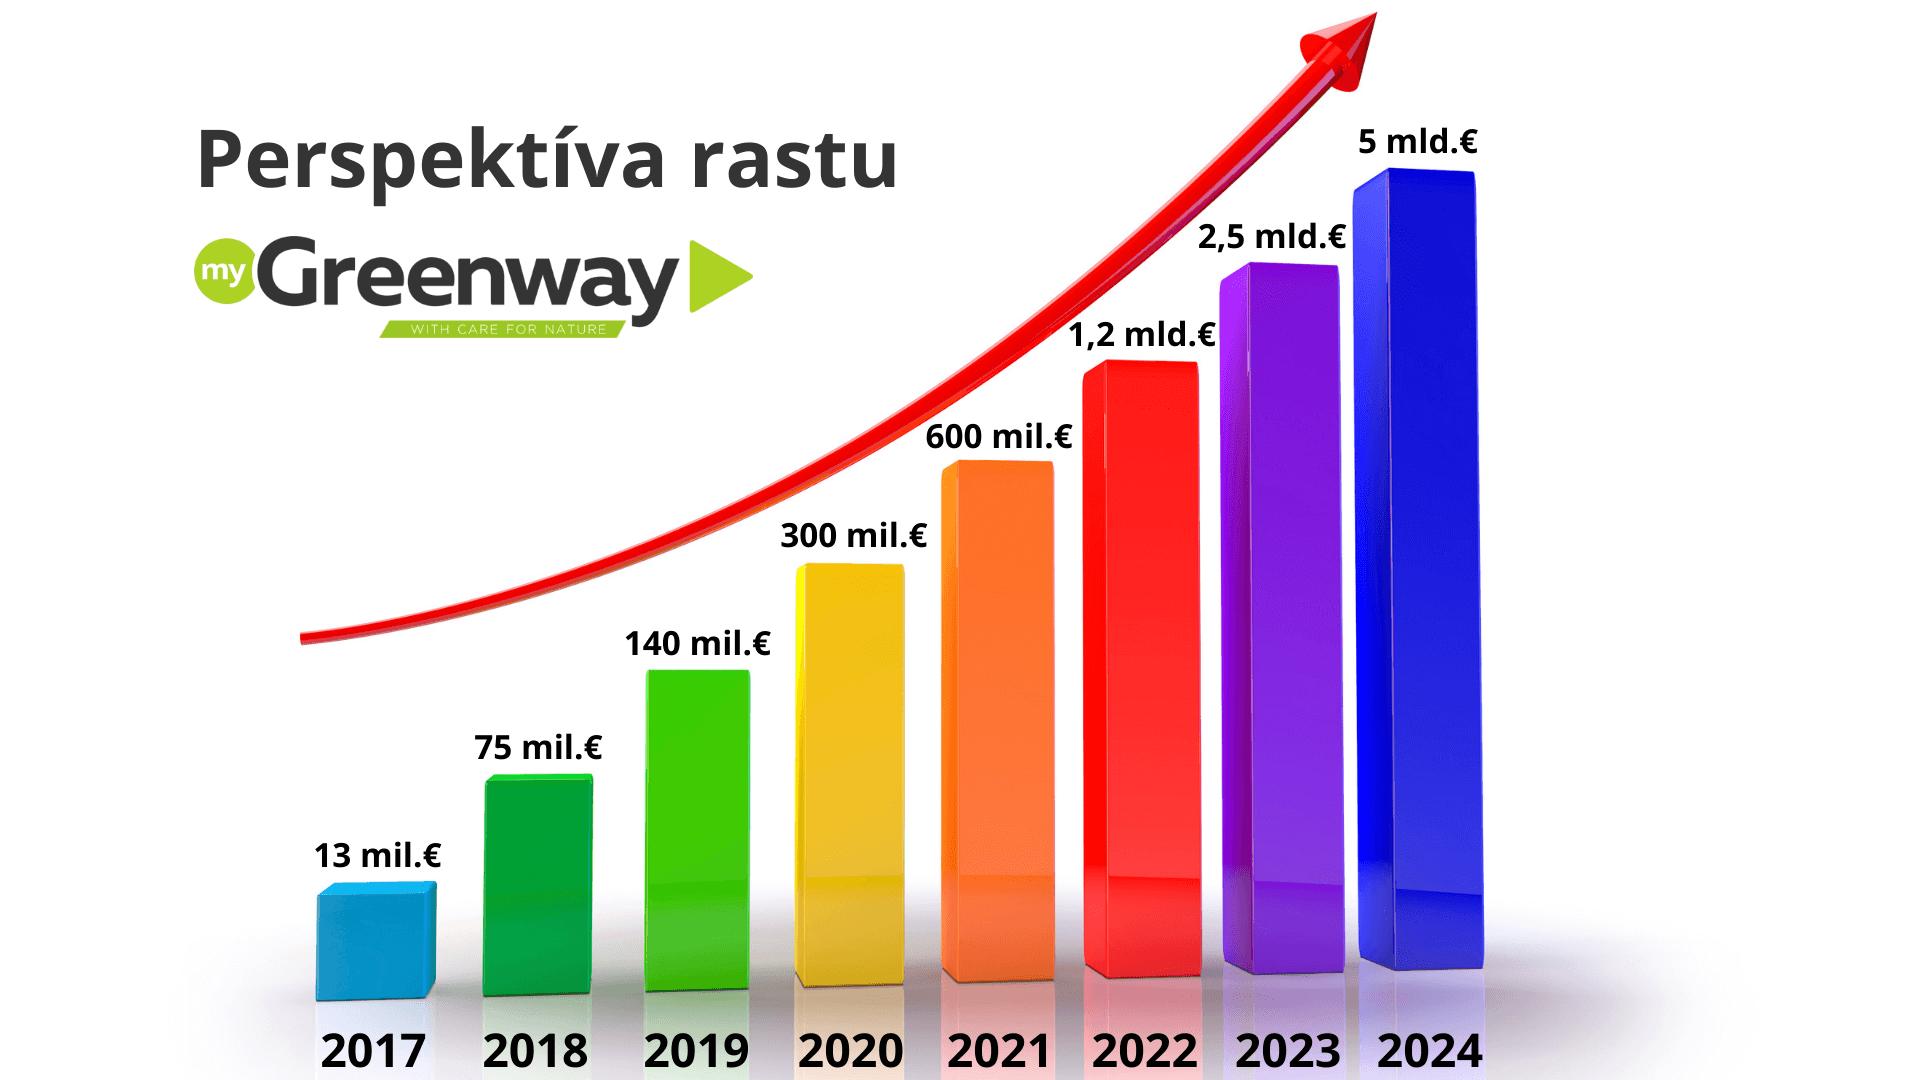 rast-greenway